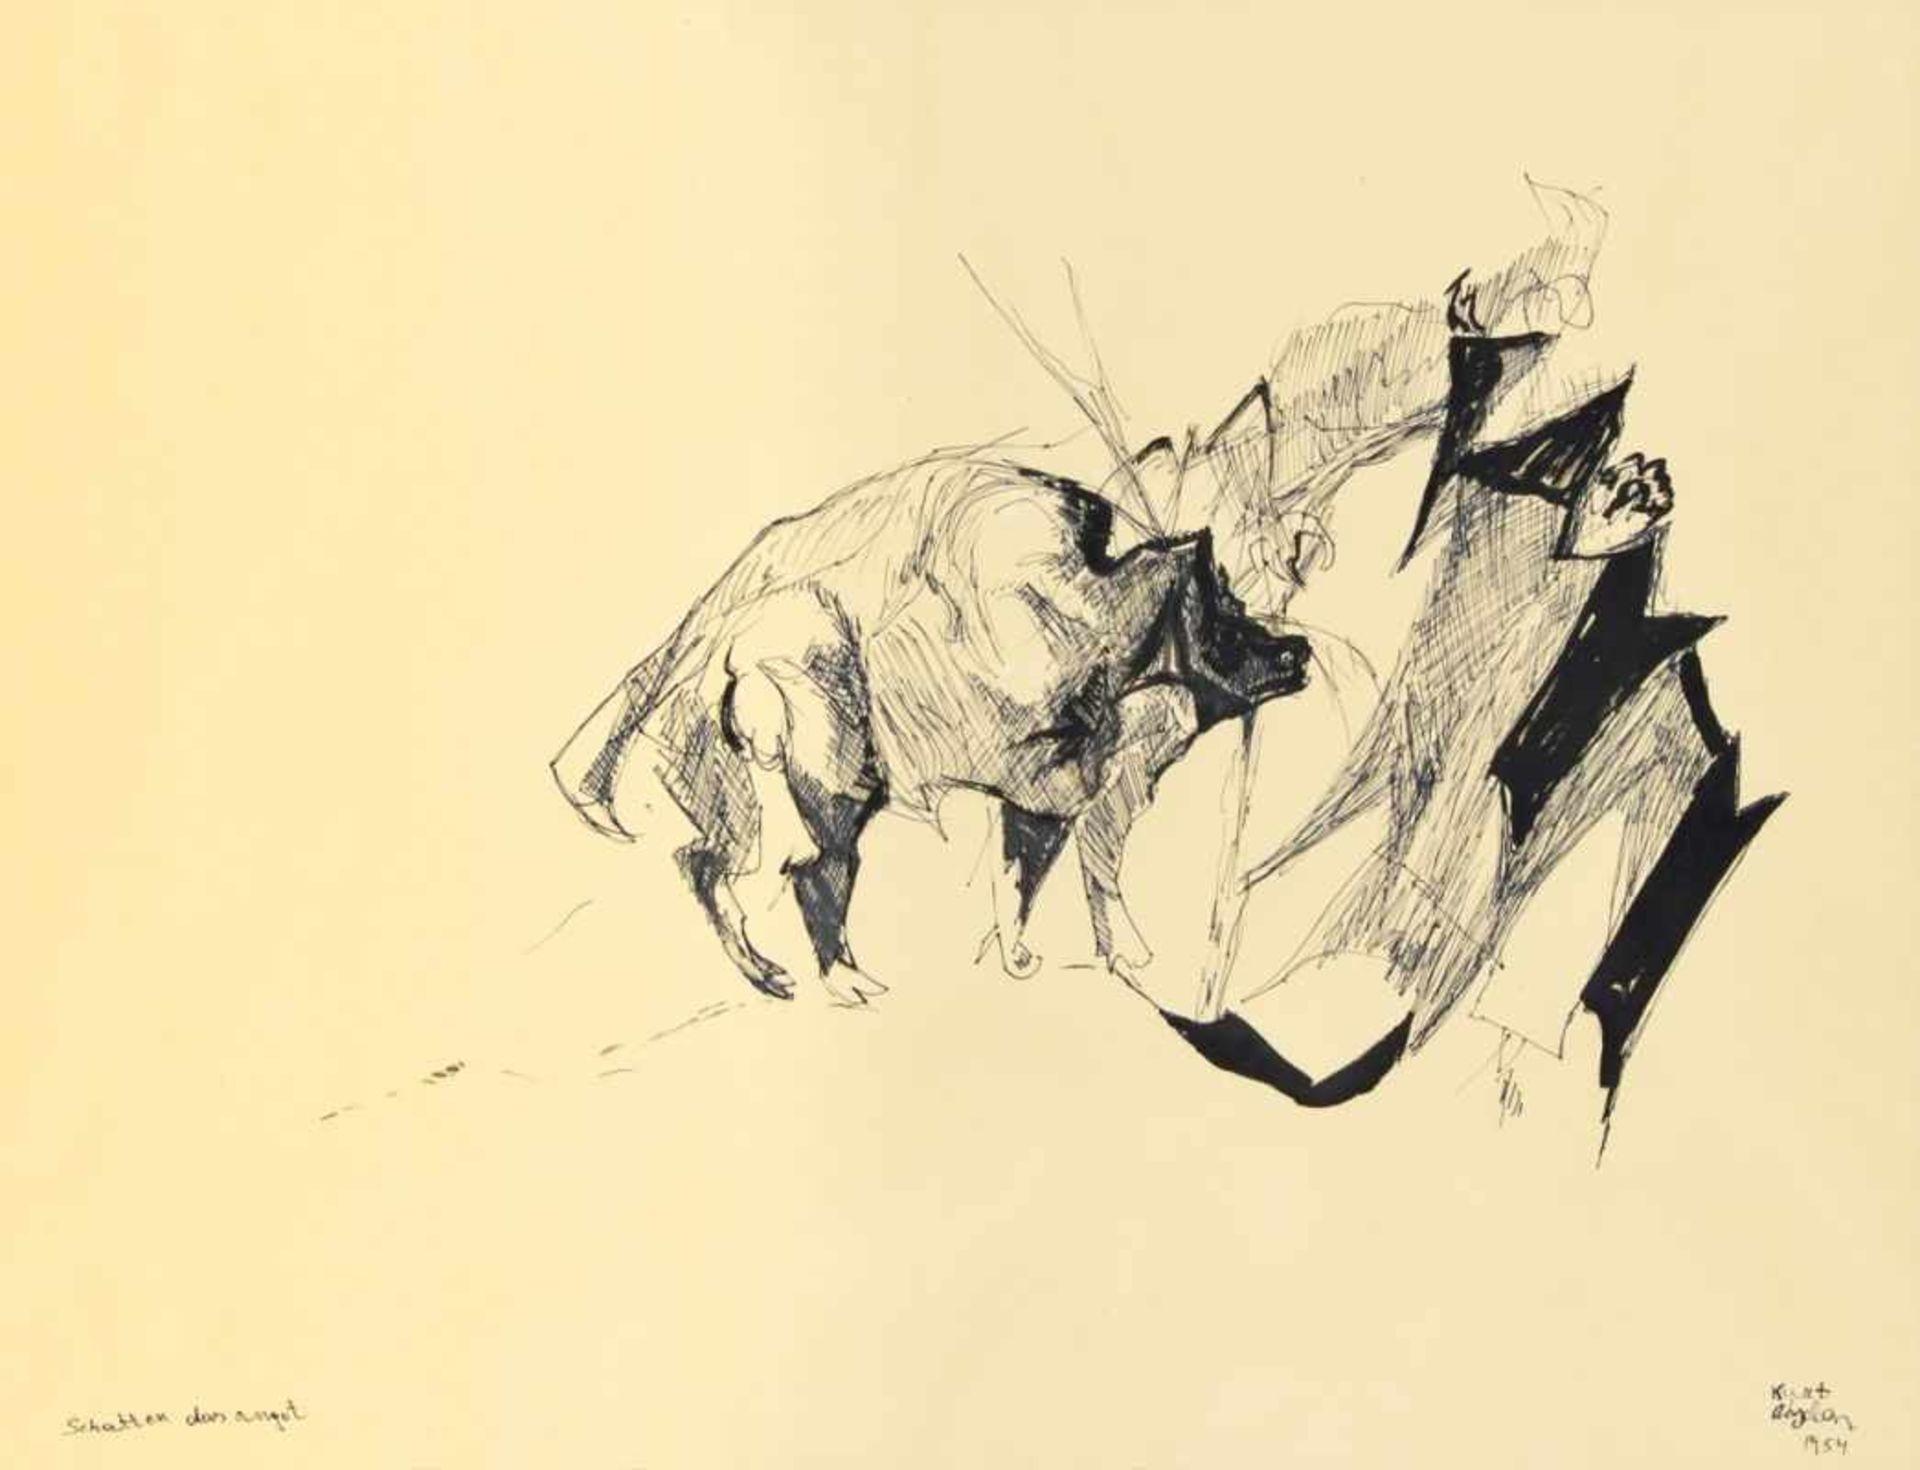 Los 65 - KURT ABSOLON(1925 WIEN - 1958 WULKAPRODERSDORF)SCHATTEN DER ANGST, 1954Tusche auf Papier, 49 x 64